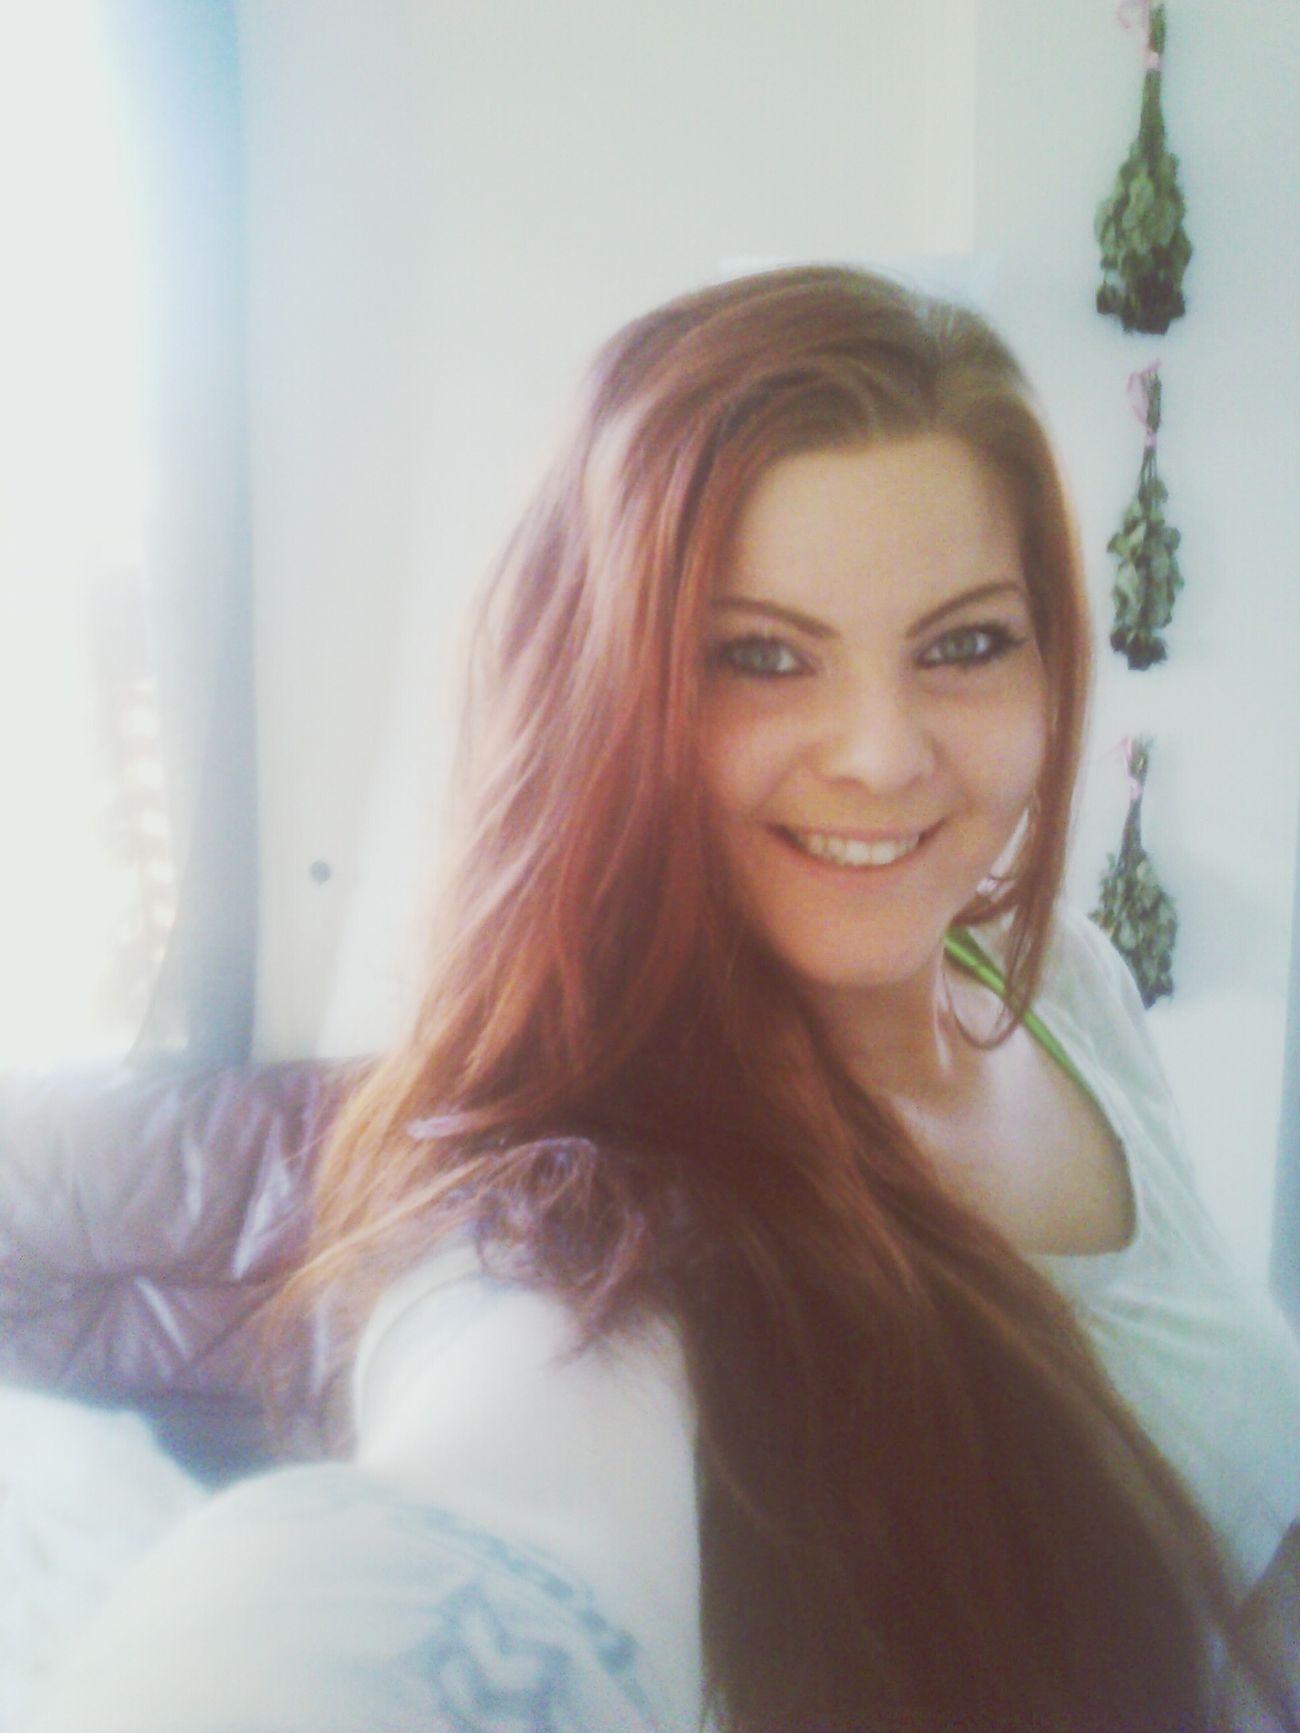 Swedish Girl Happy Smiling Summer 2013